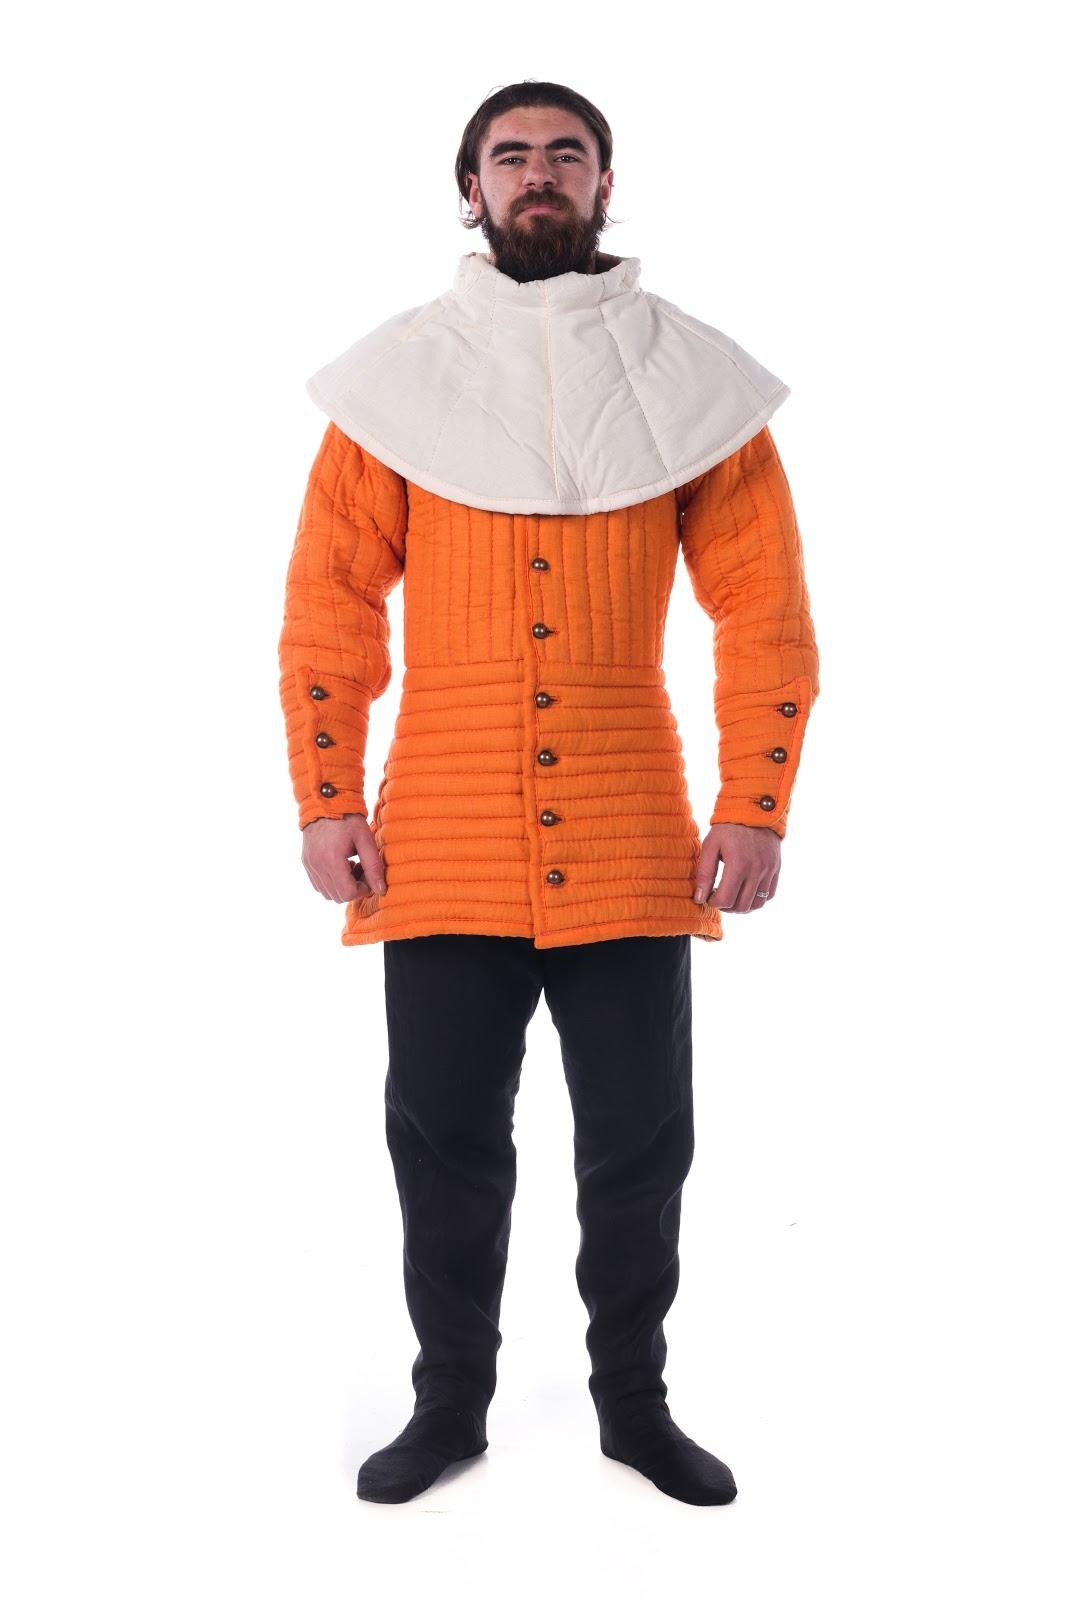 cotton_padded_aventail_for _bascinet_and_barbute_helmets.jpg